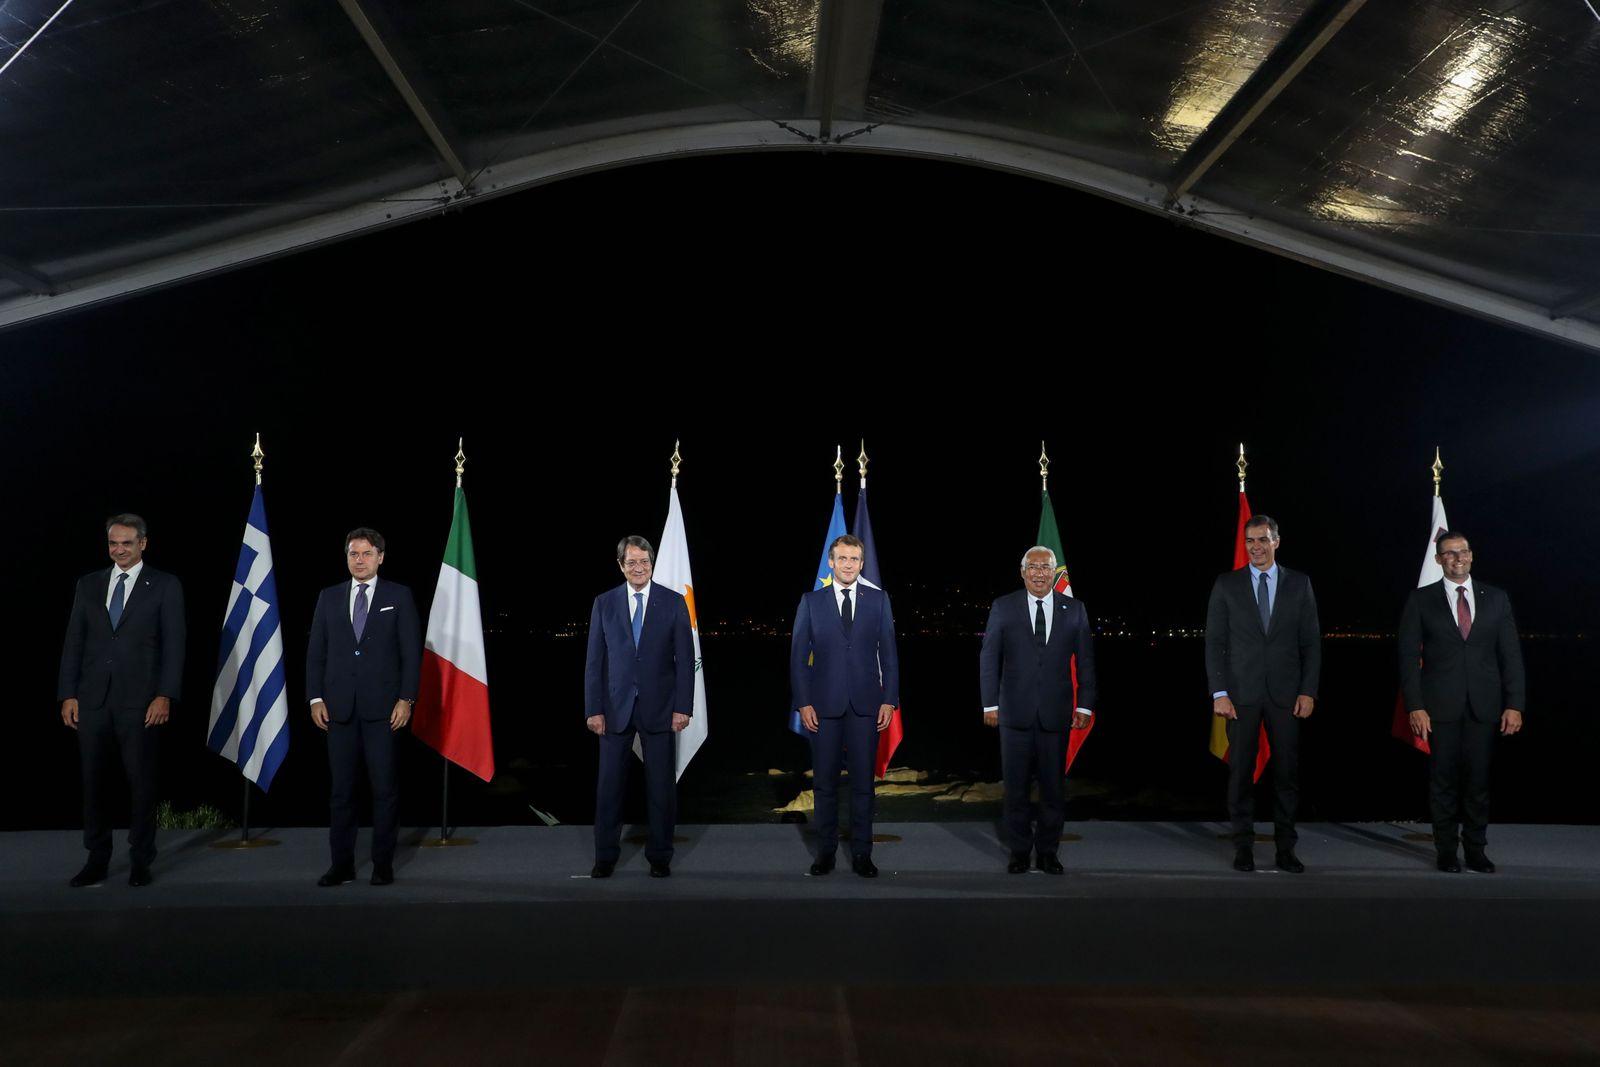 7th MED7 Mediterranean countries summit, Porticcio, France - 10 Sep 2020